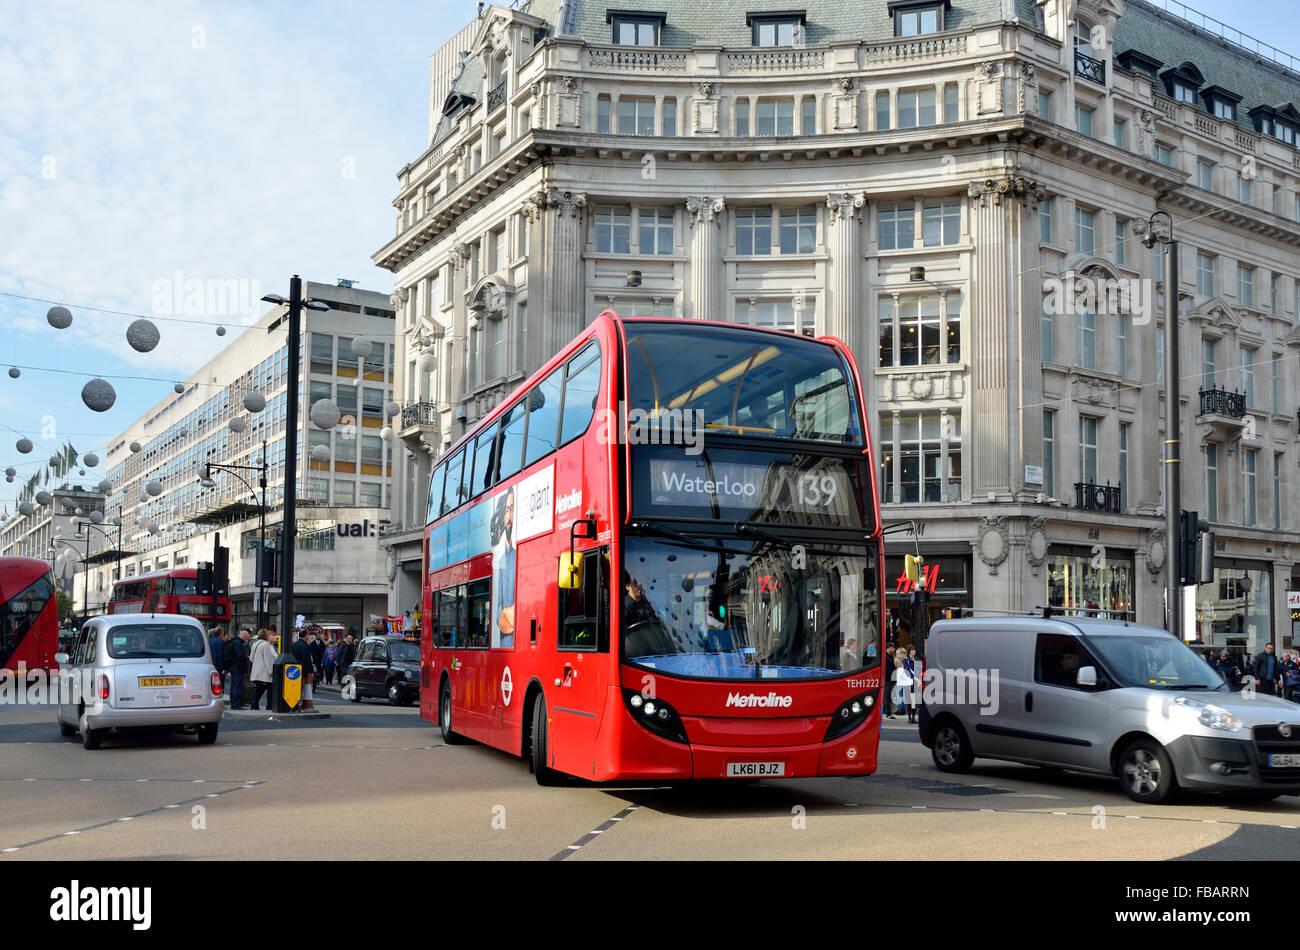 Double Decker Bus In Oxford Circus